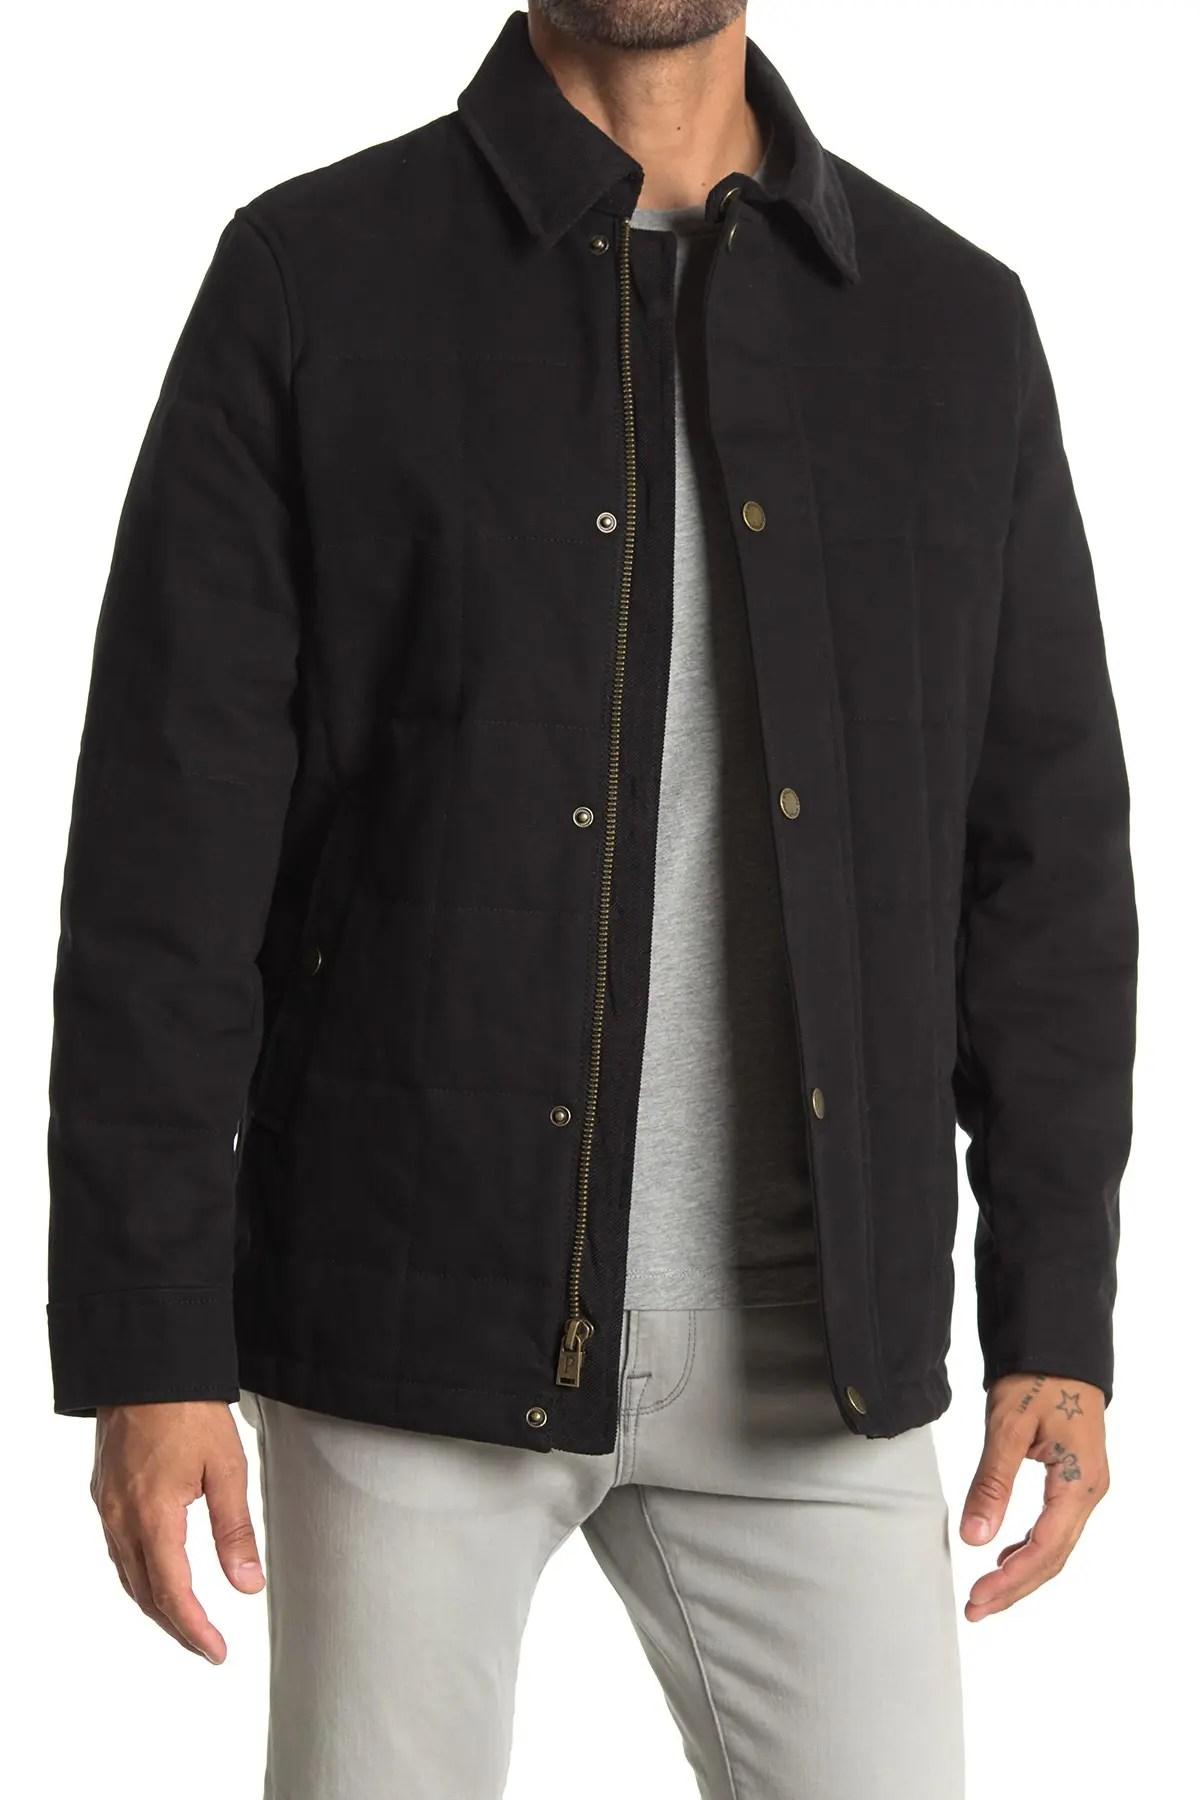 piedmont jacket